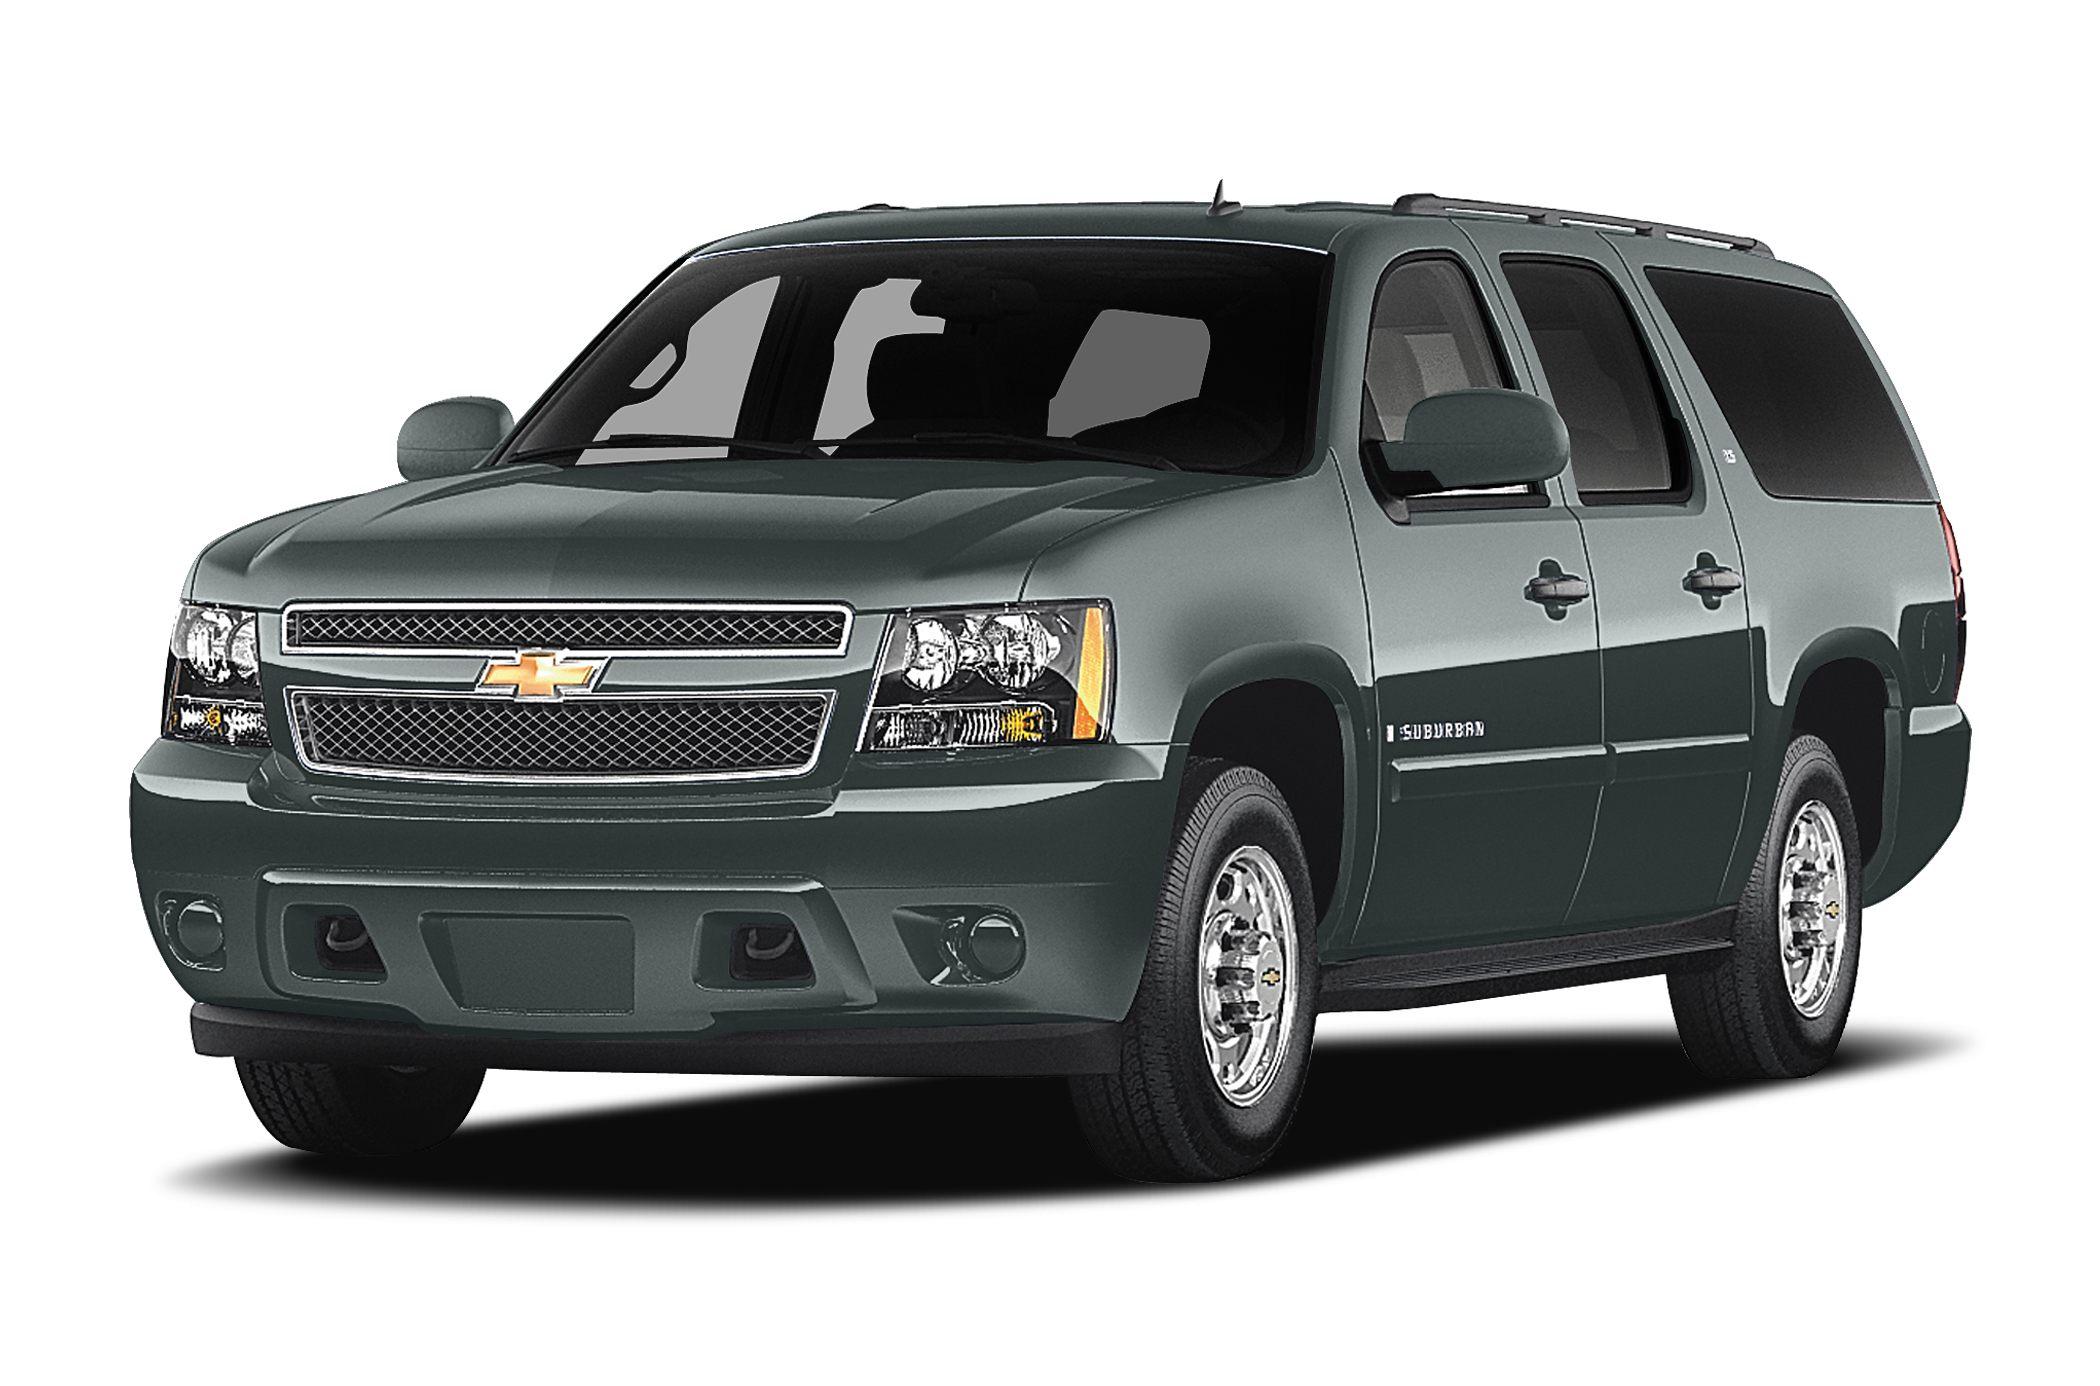 2009 Chevrolet Suburban 2500